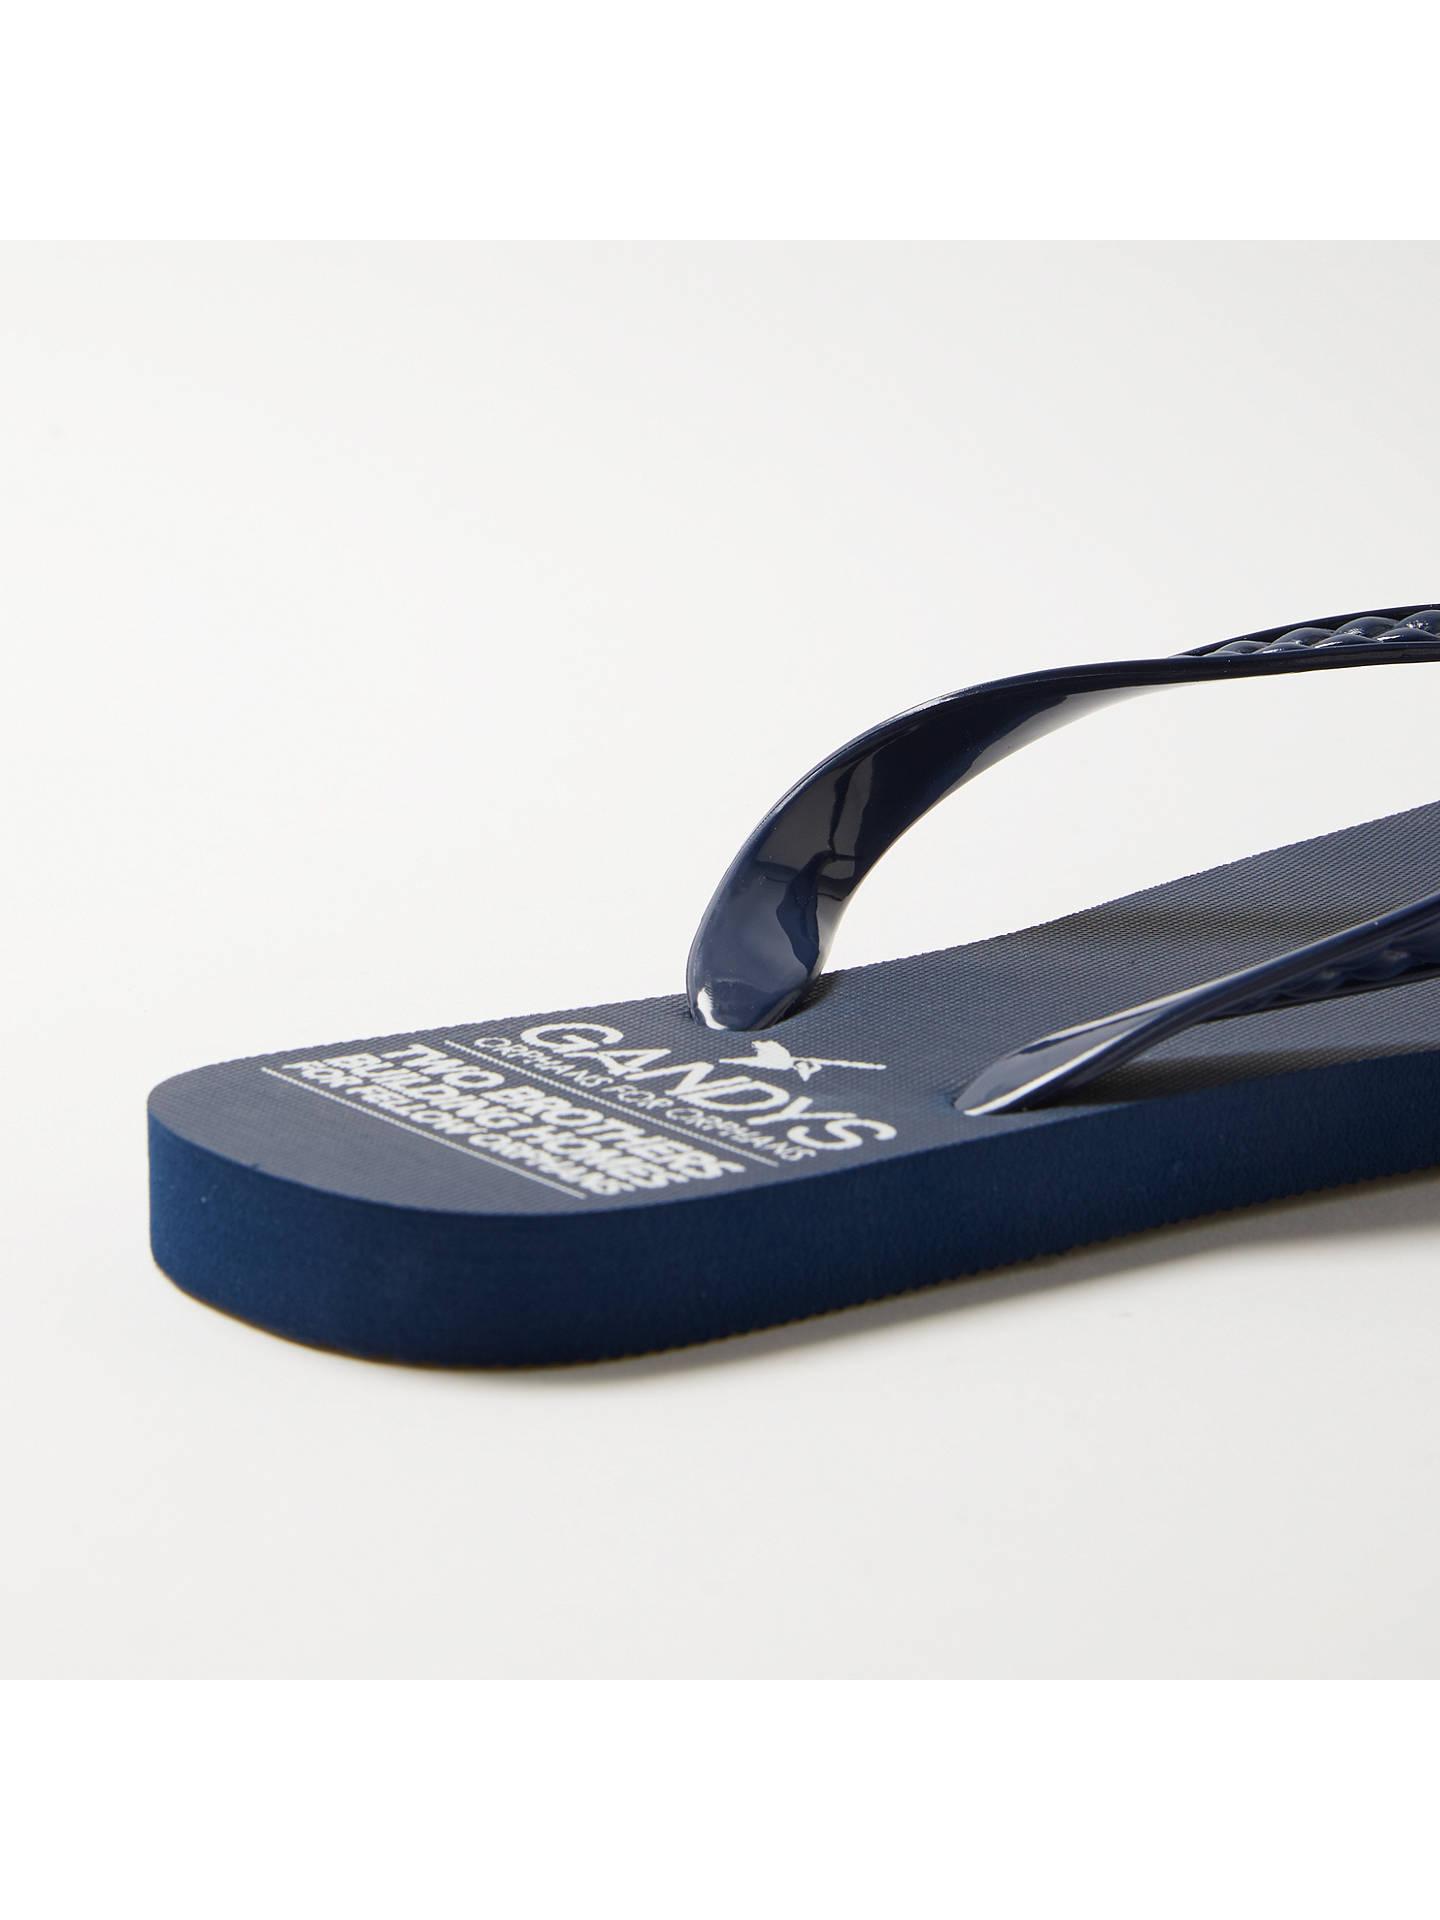 4bb56656c Buy Gandys for John Lewis Original Flip Flops